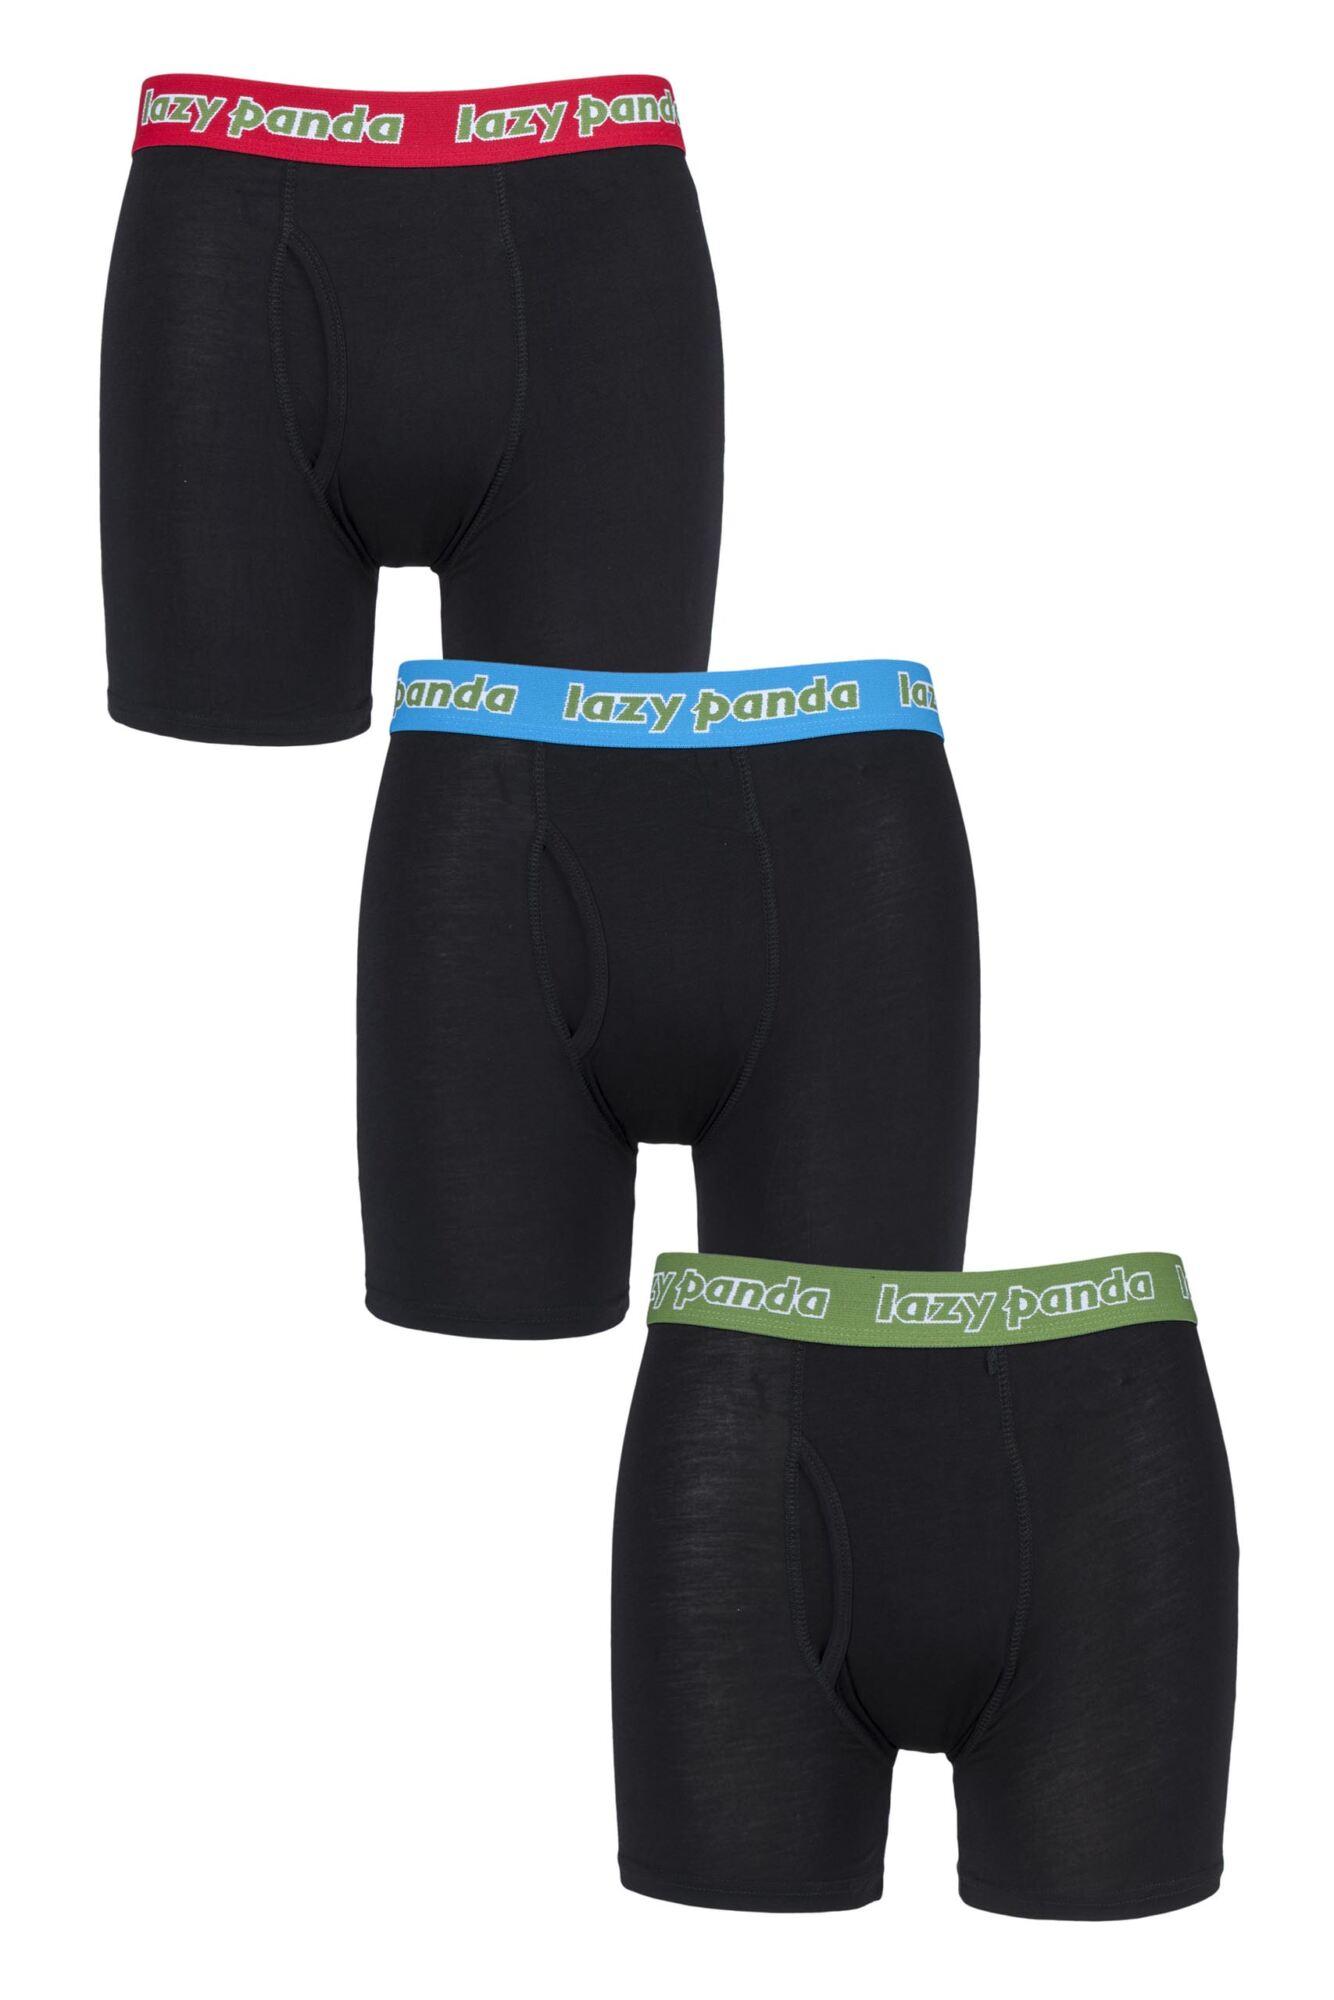 3 Pack Bamboo Boxer Shorts Men's - Lazy Panda